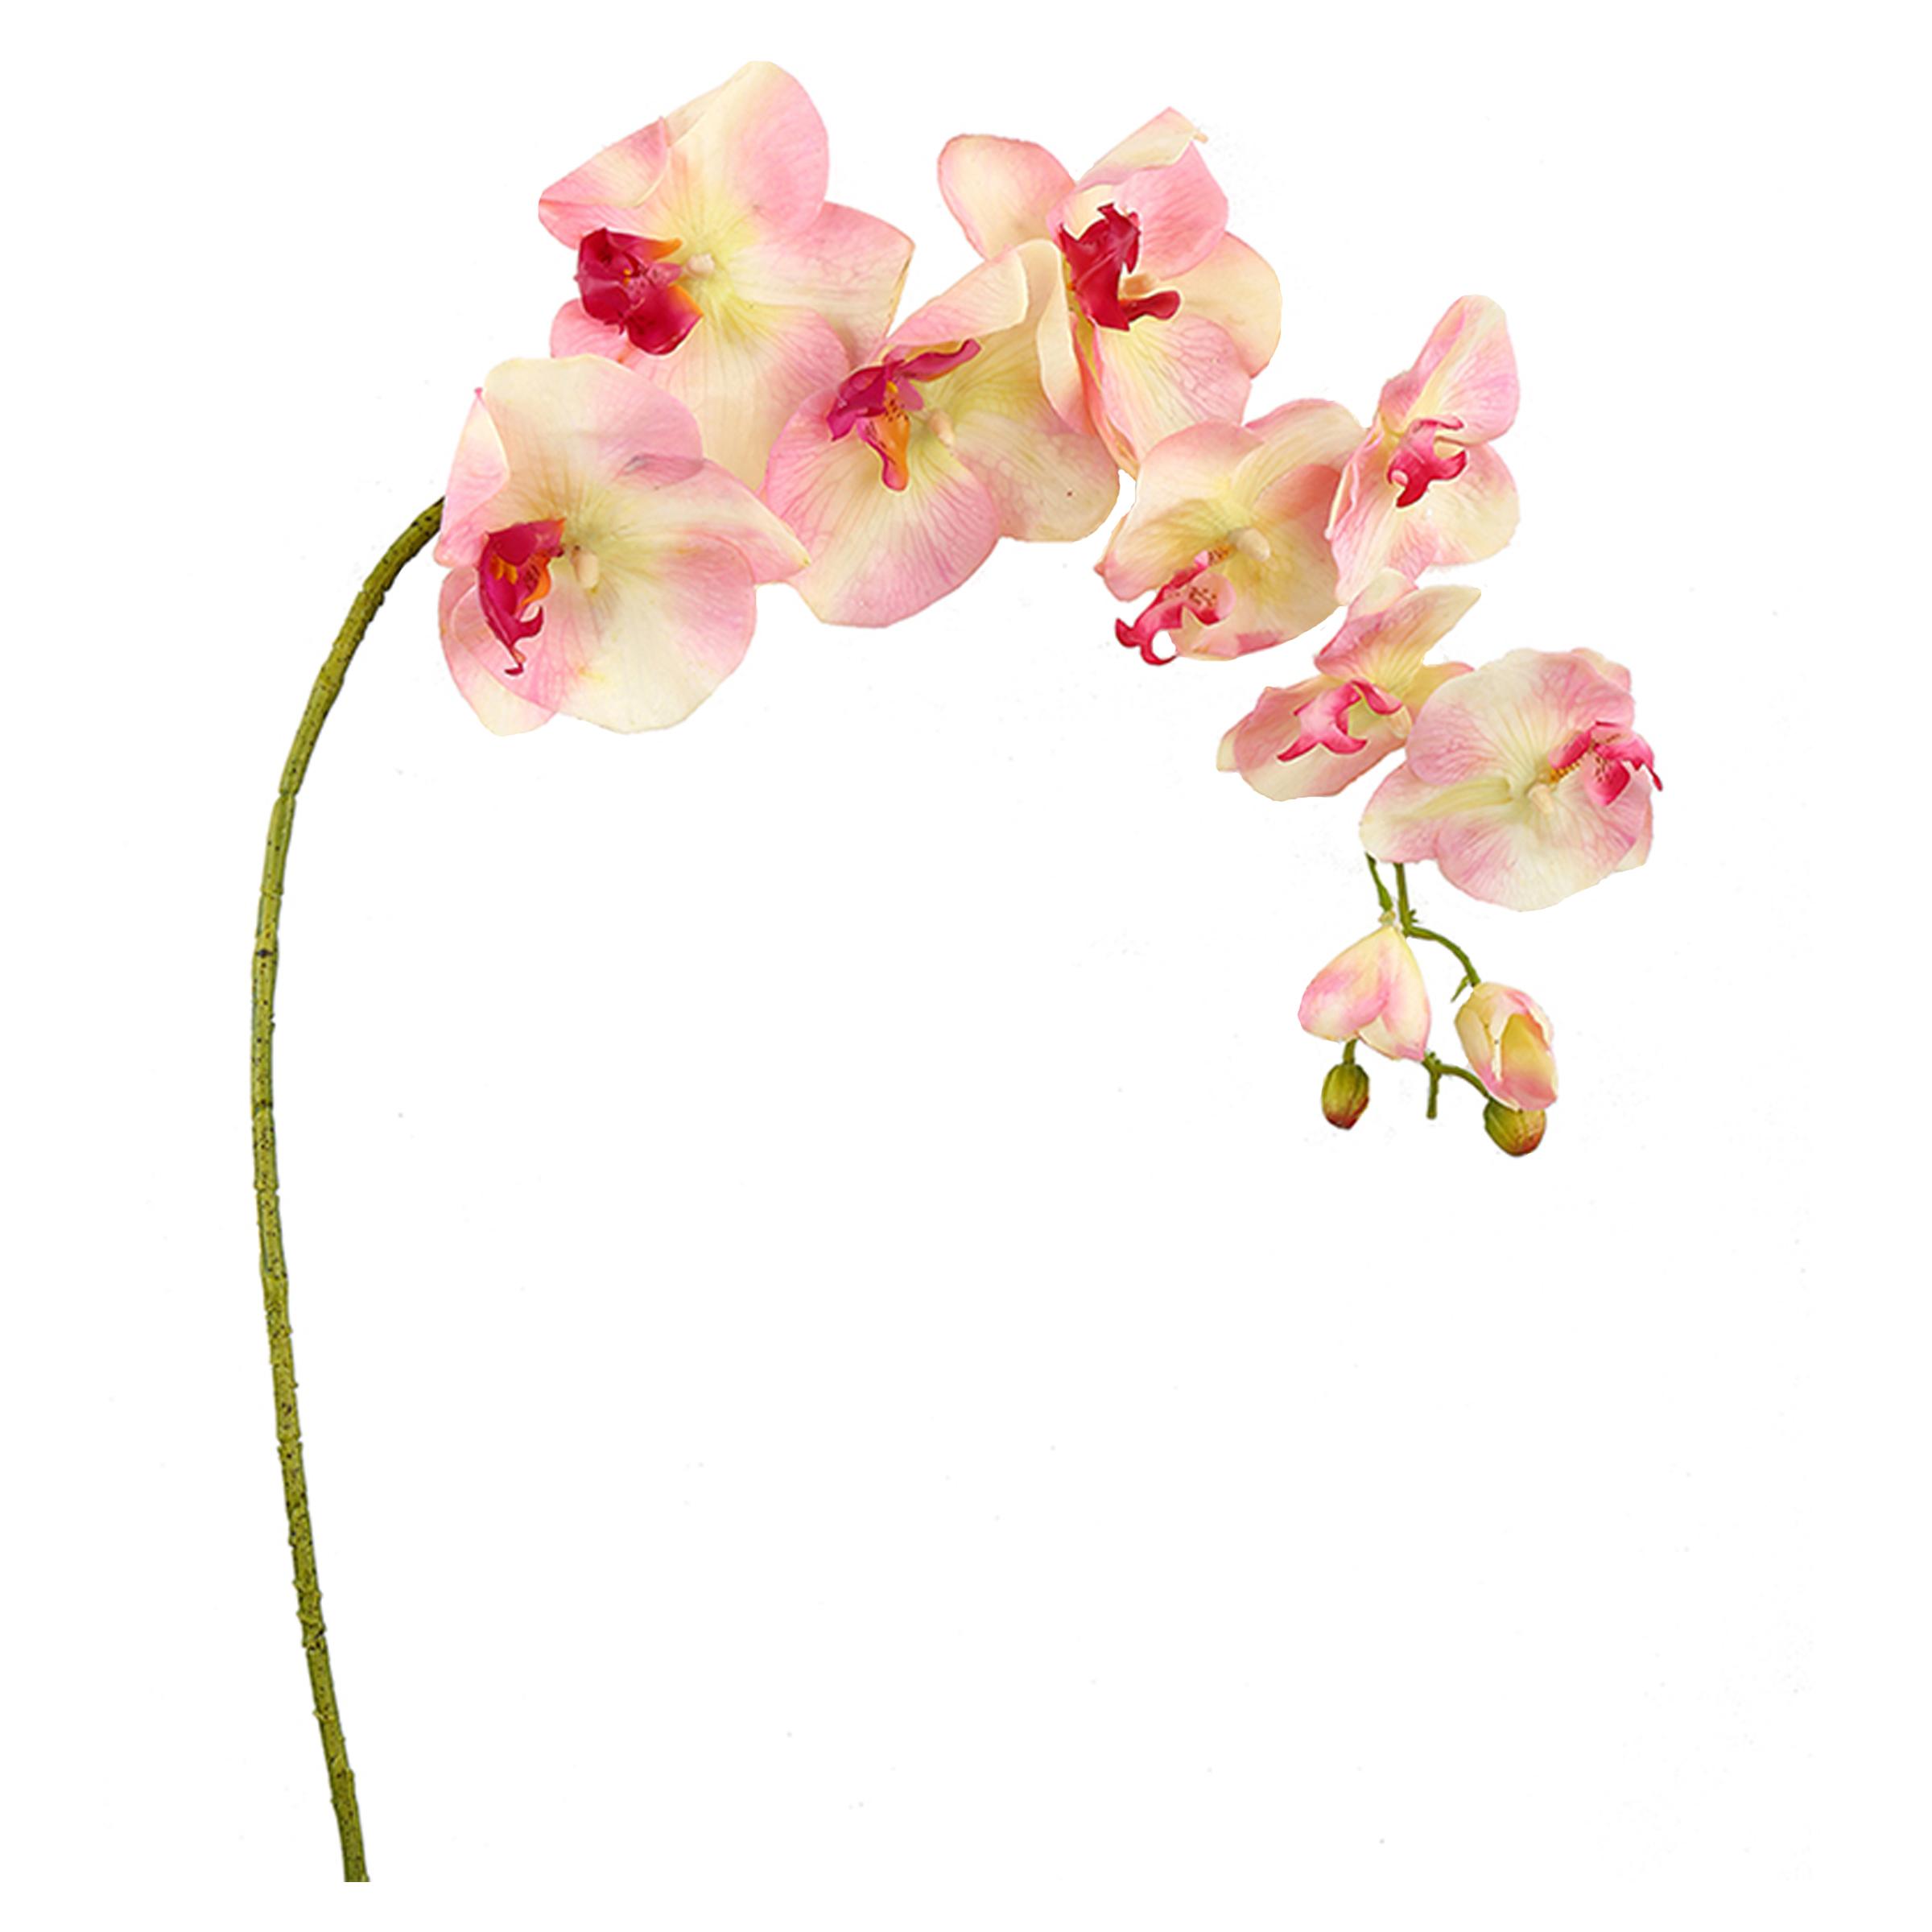 گل مصنوعی هومز طرح شاخه ارکیده کد 50109 بسته 2 عددی